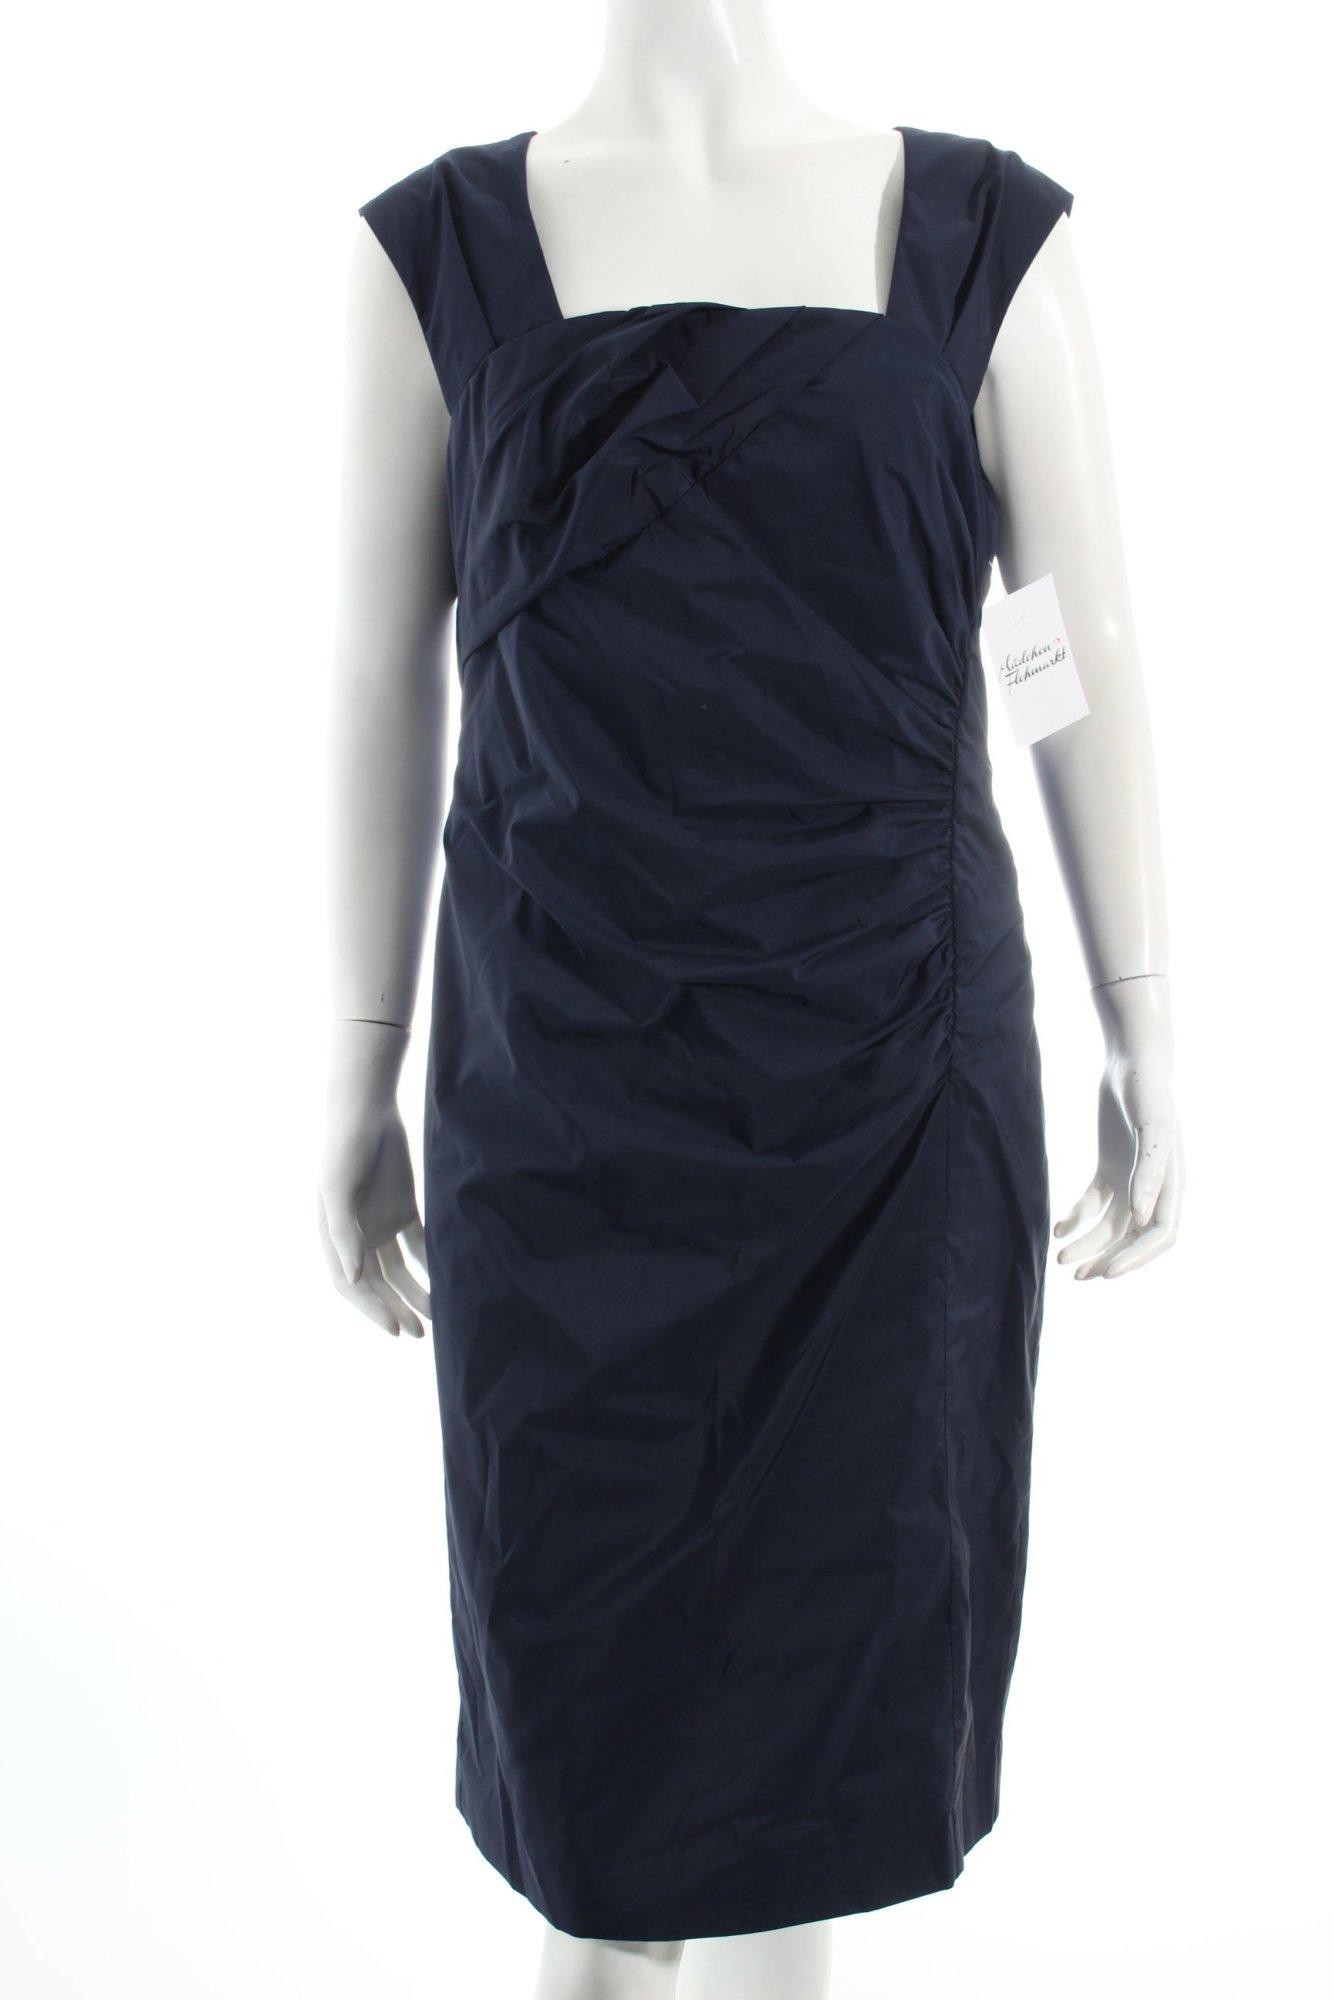 vera mont etuikleid dunkelblau eleganz look damen gr de 40 kleid dress. Black Bedroom Furniture Sets. Home Design Ideas